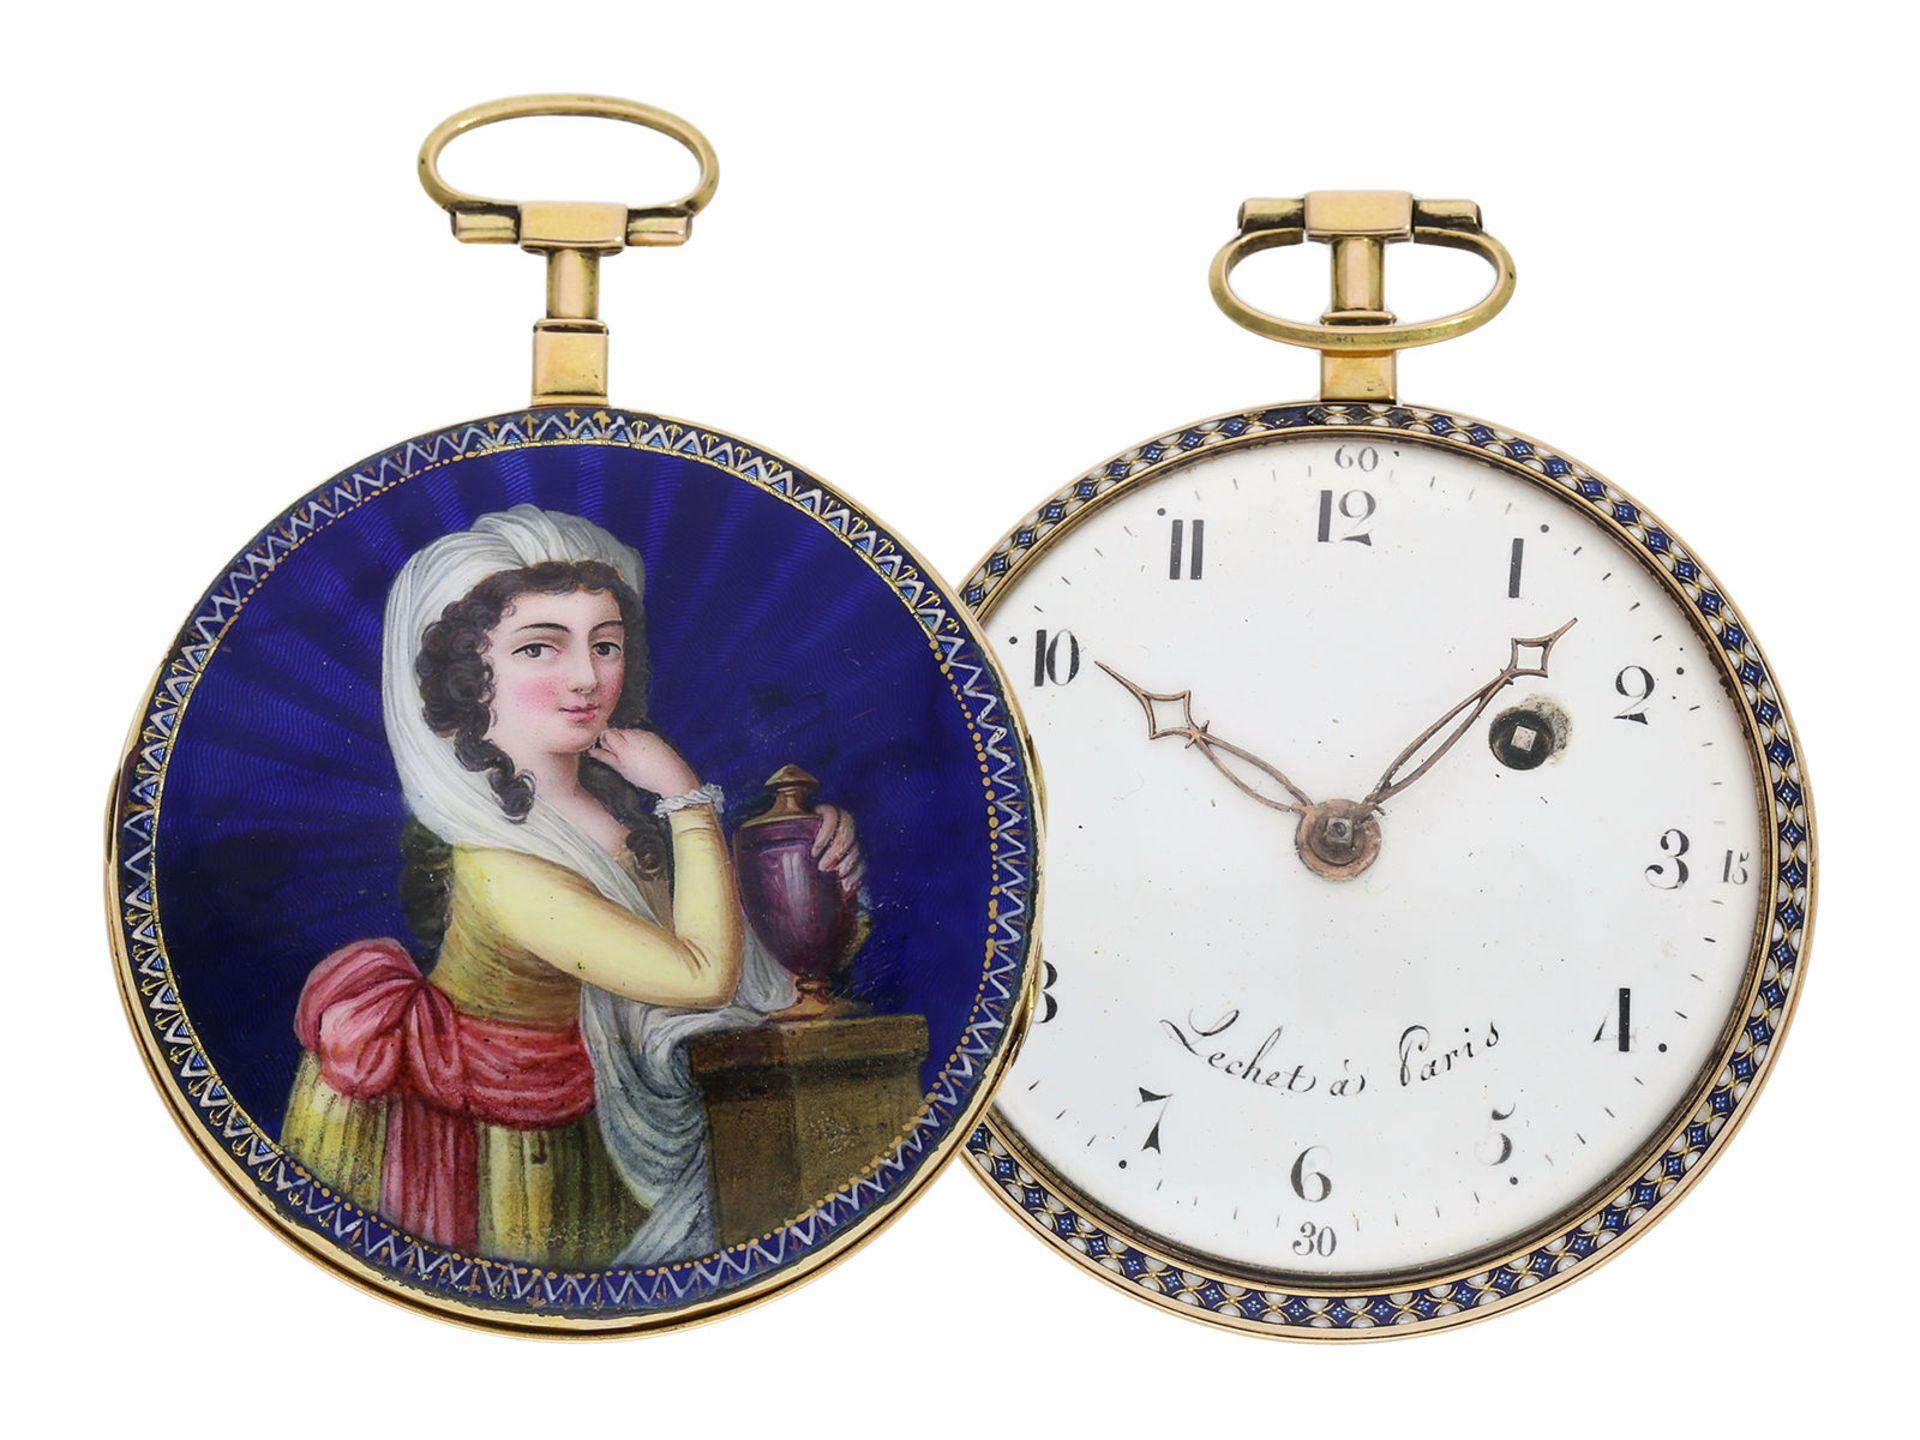 Pocket watch: large gold/ enamel pocket watch, Lechet a Paris, ca. 1795